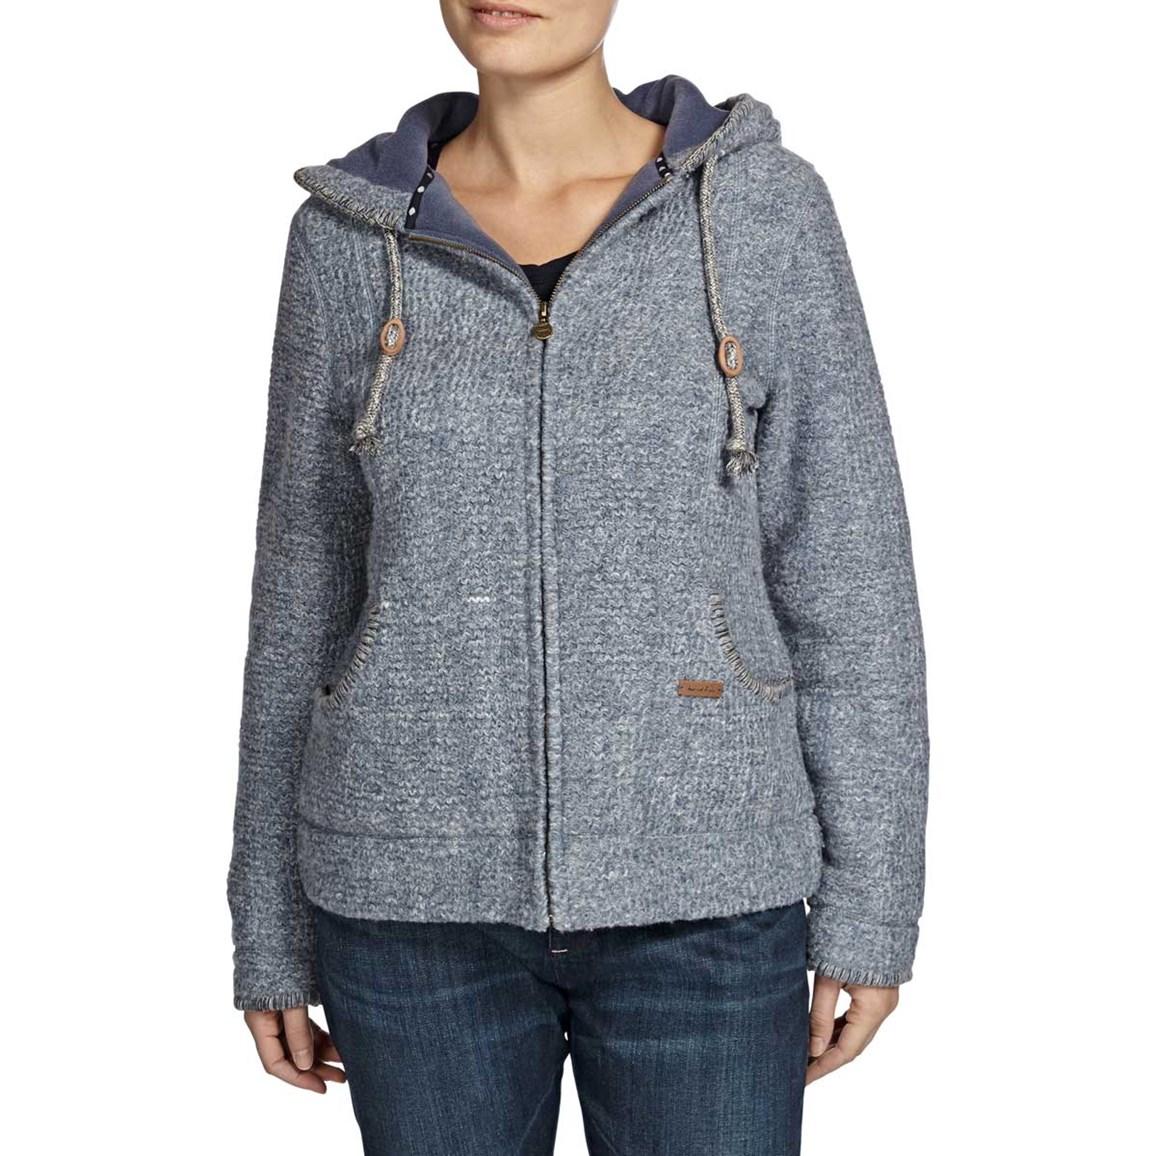 Valby Zipped Wool Blend Hooded Fleece Storm